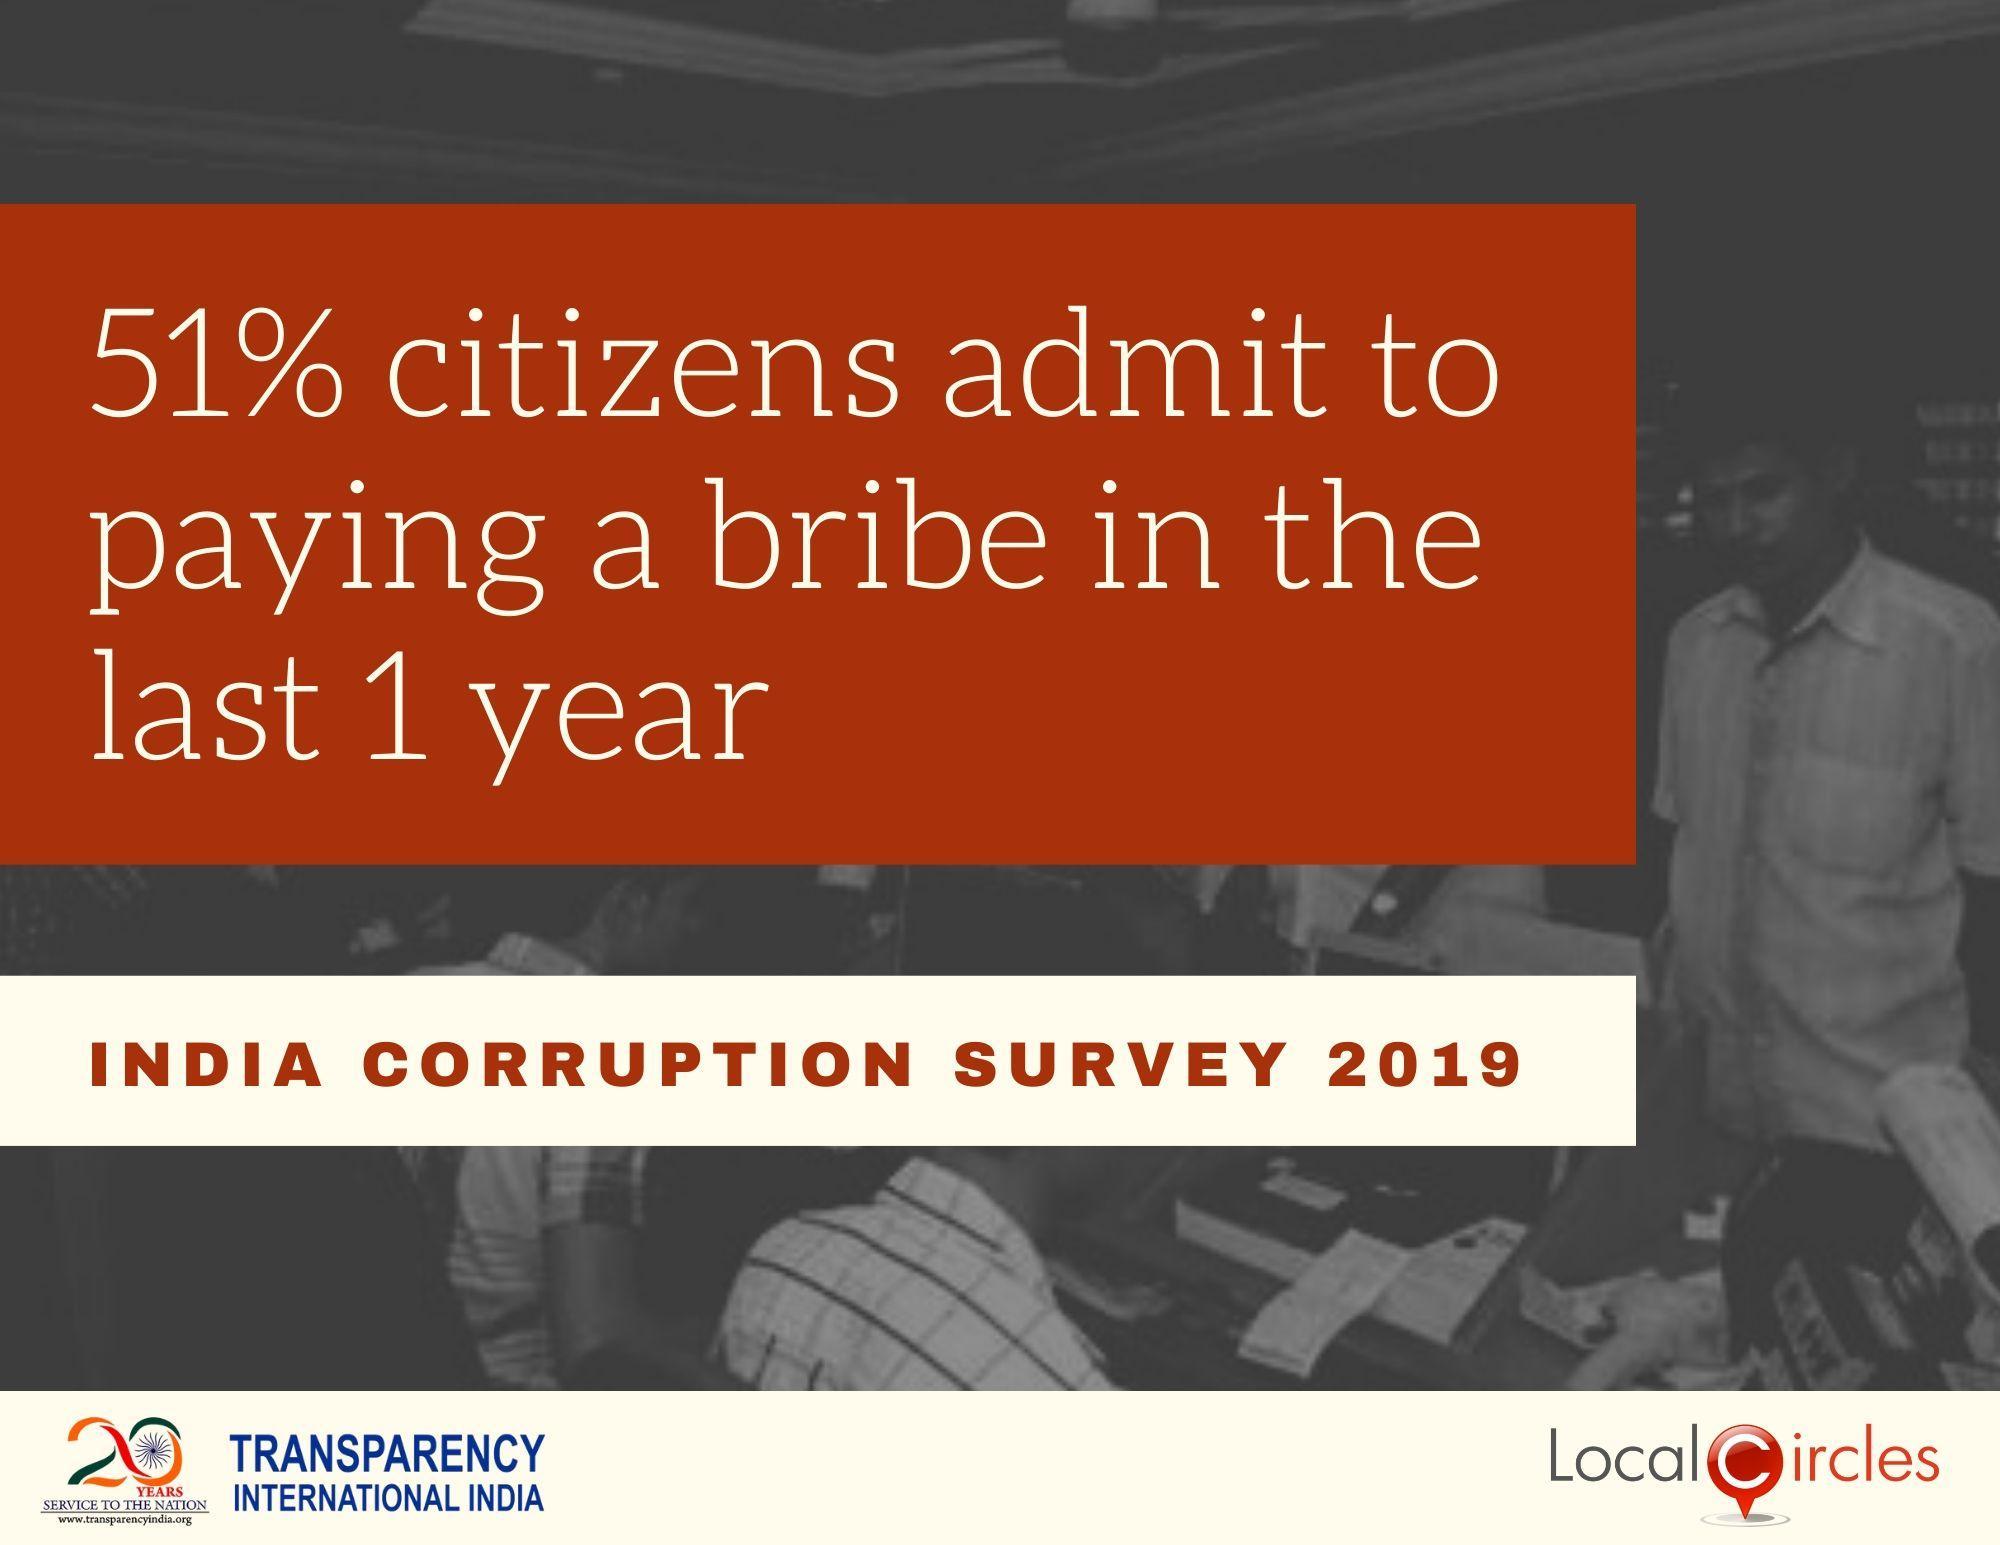 India_Corruption_Survey_2019___20191127102050___.jpg